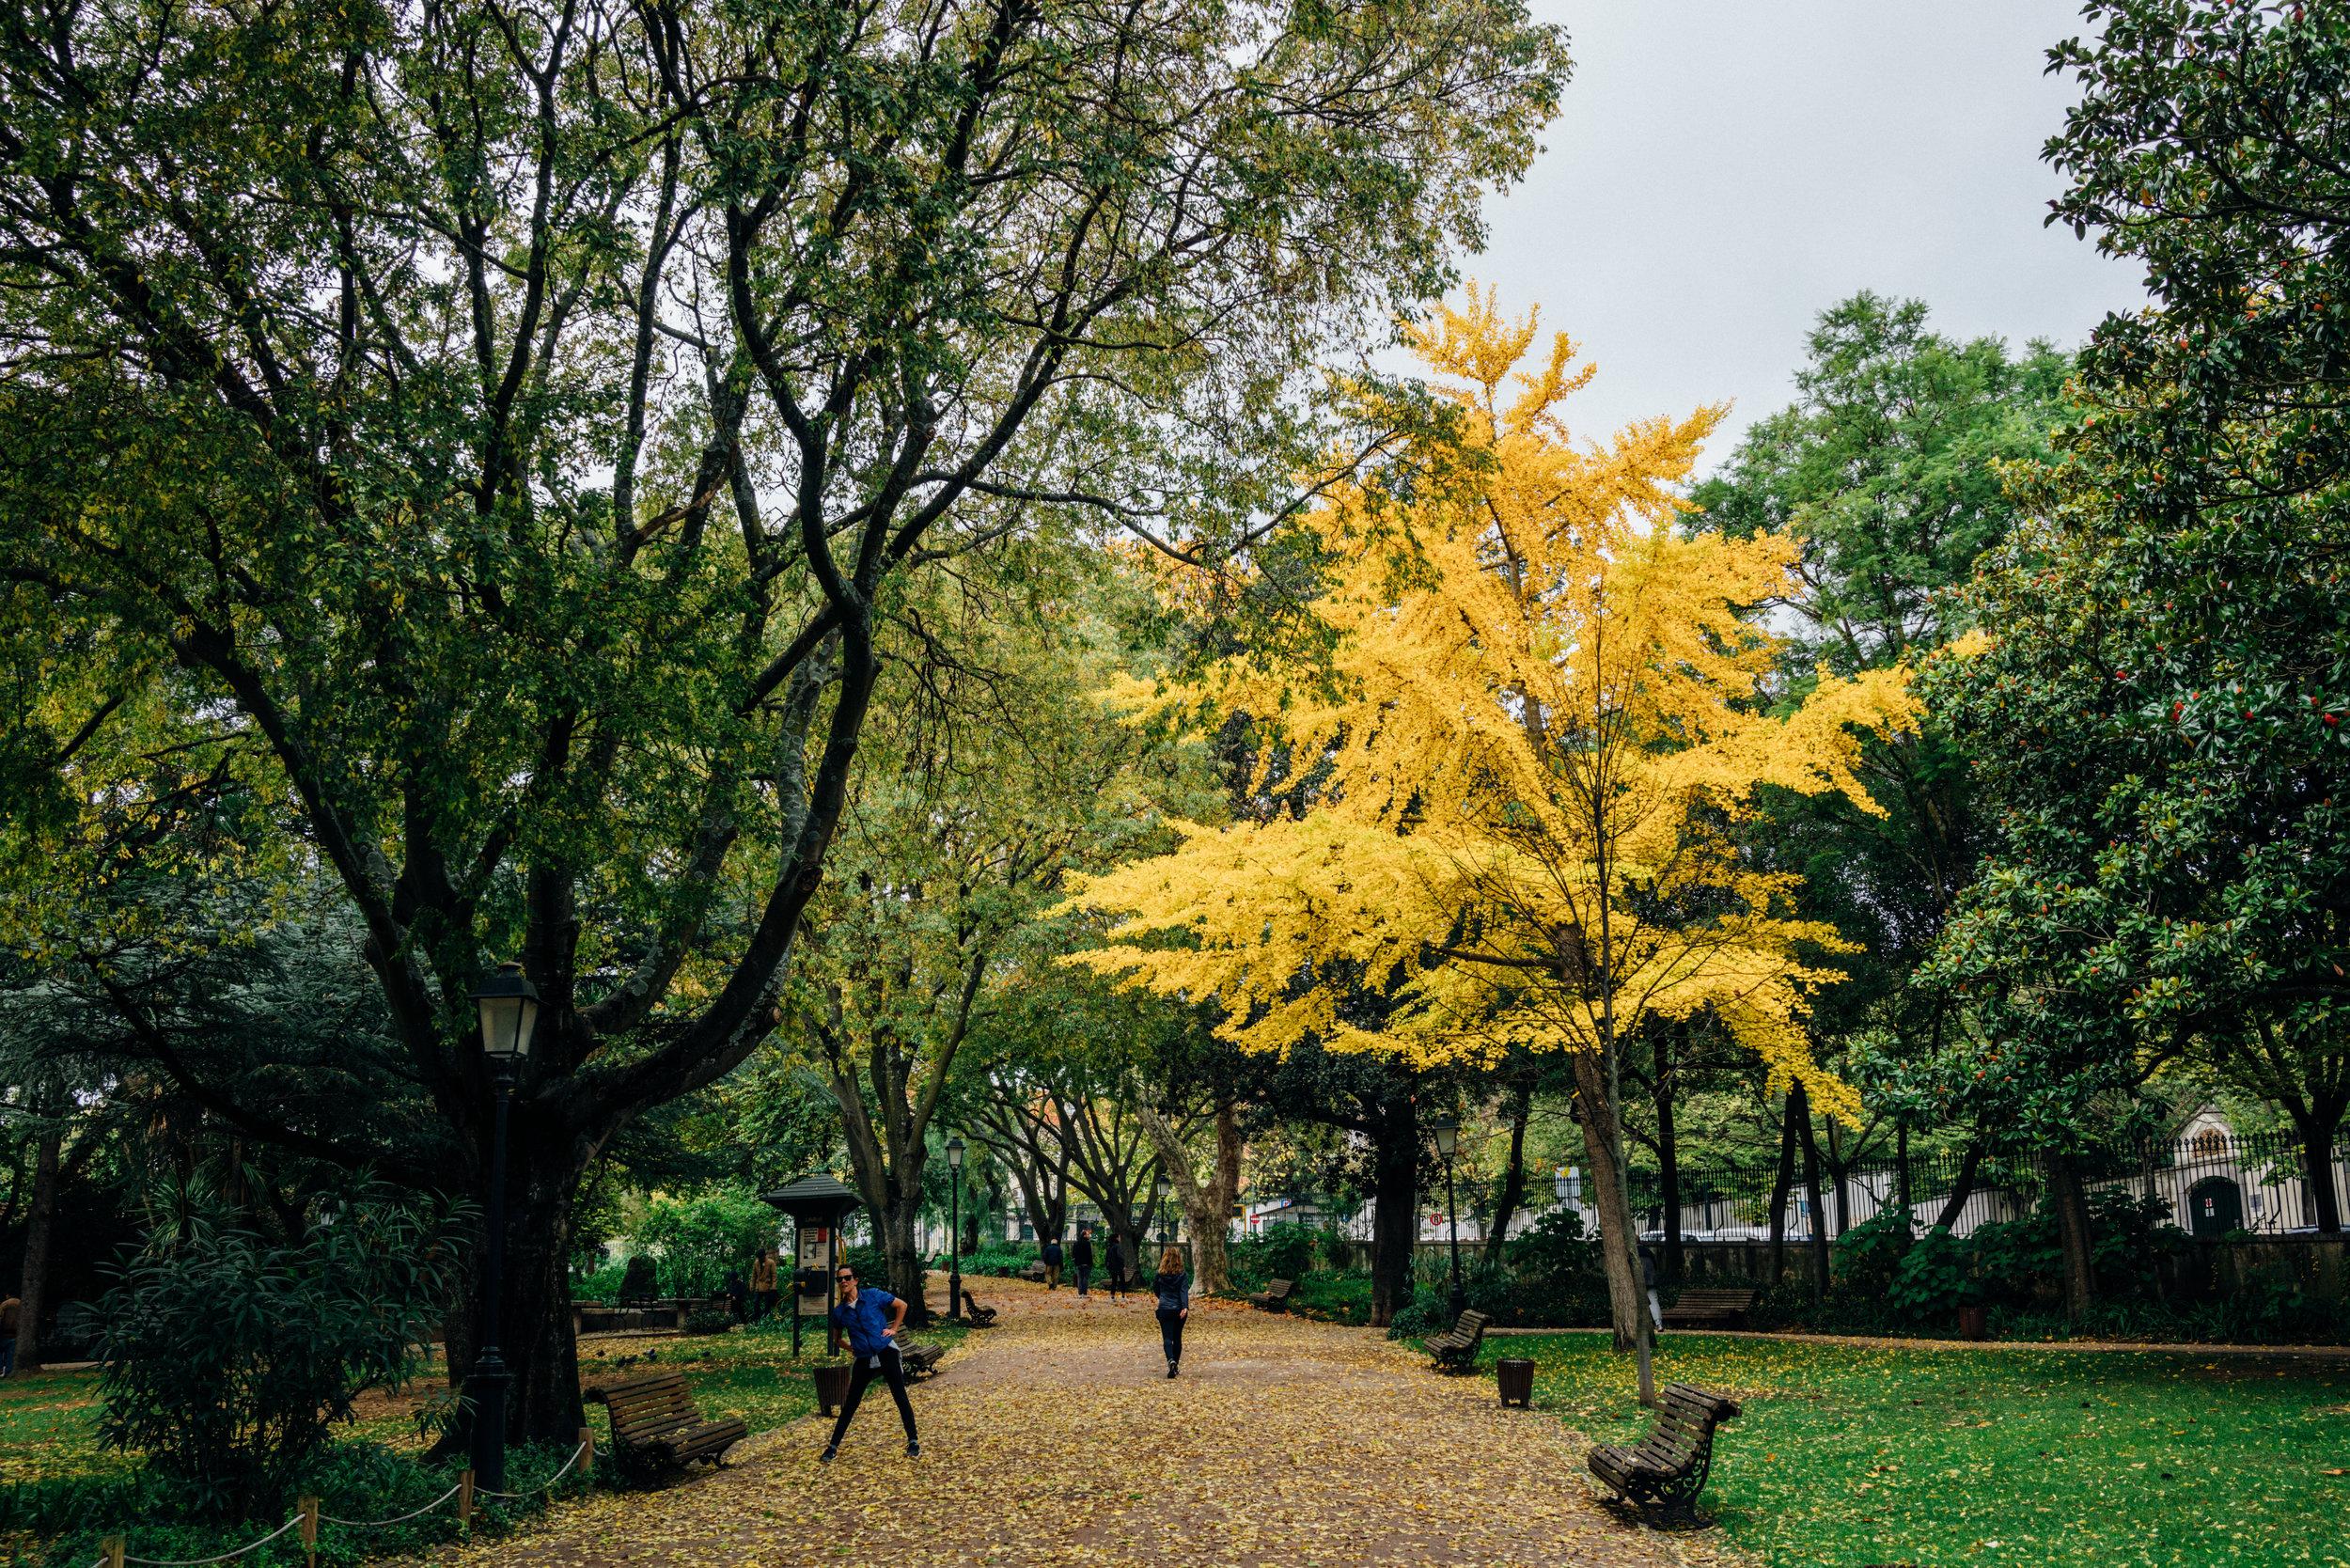 Jardim da Estrela  is one of my favorite parks in Lisbon